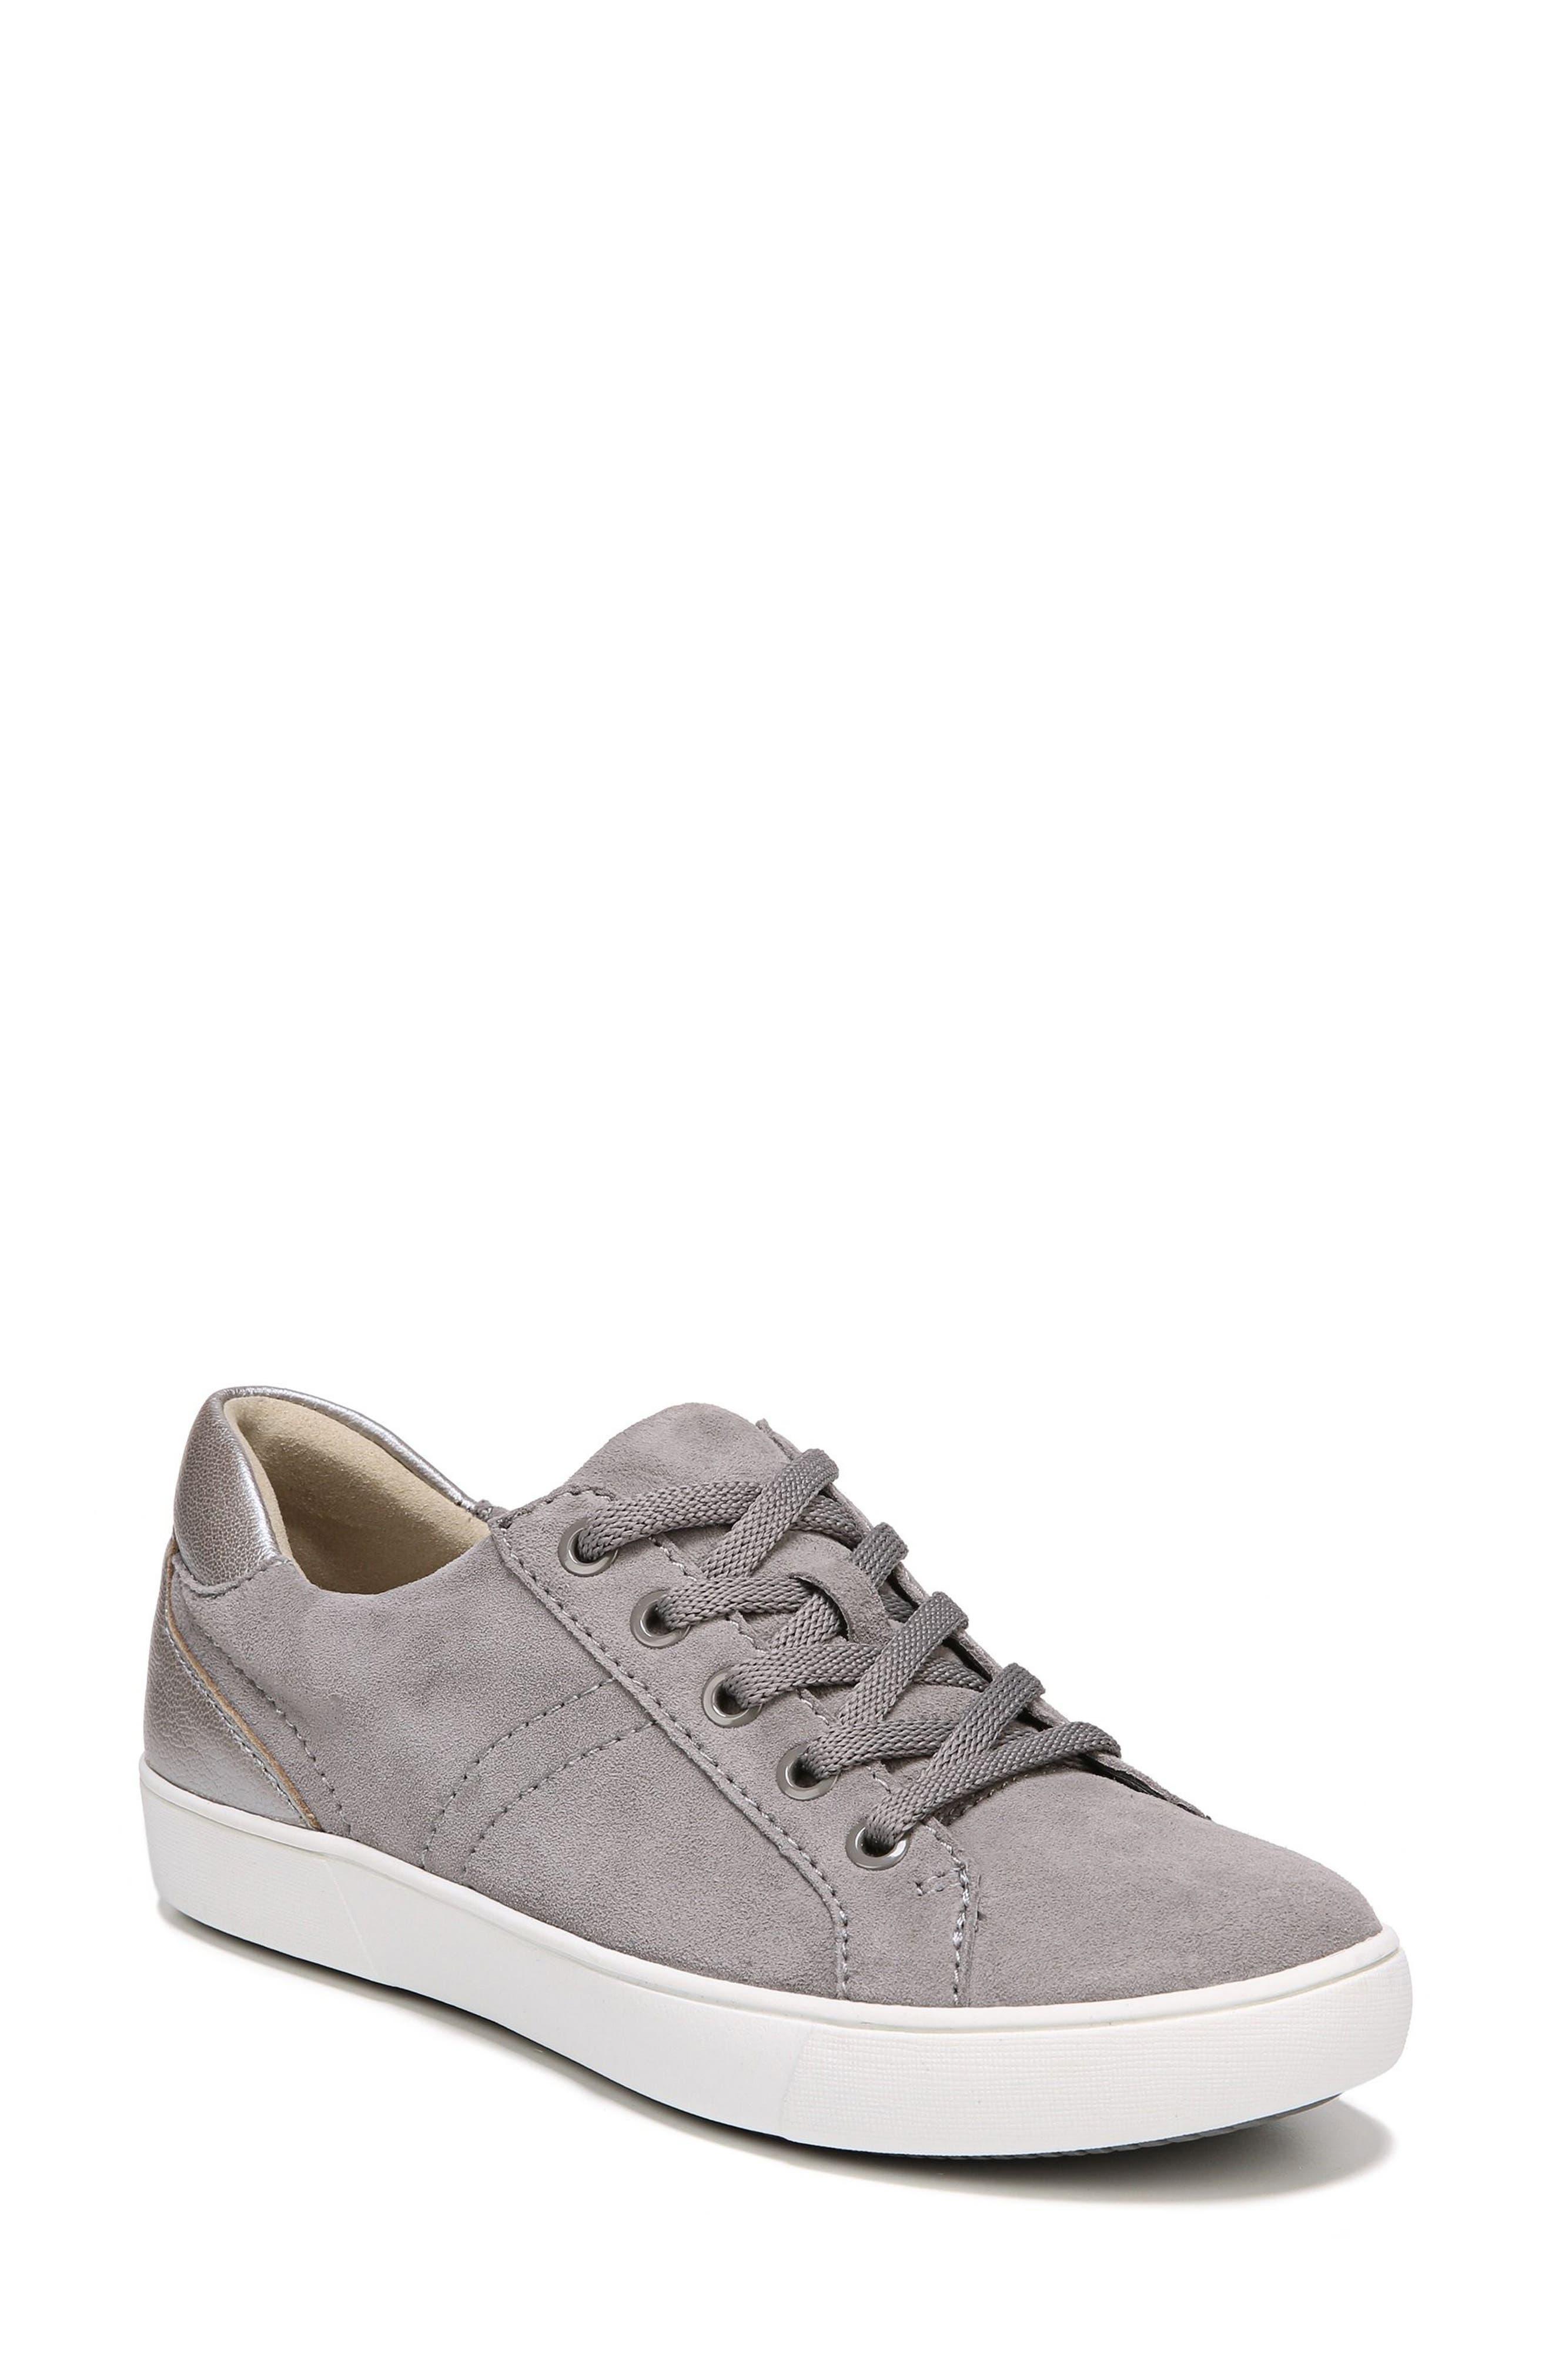 NATURALIZER Morrison Sneaker, Main, color, GREY SUEDE